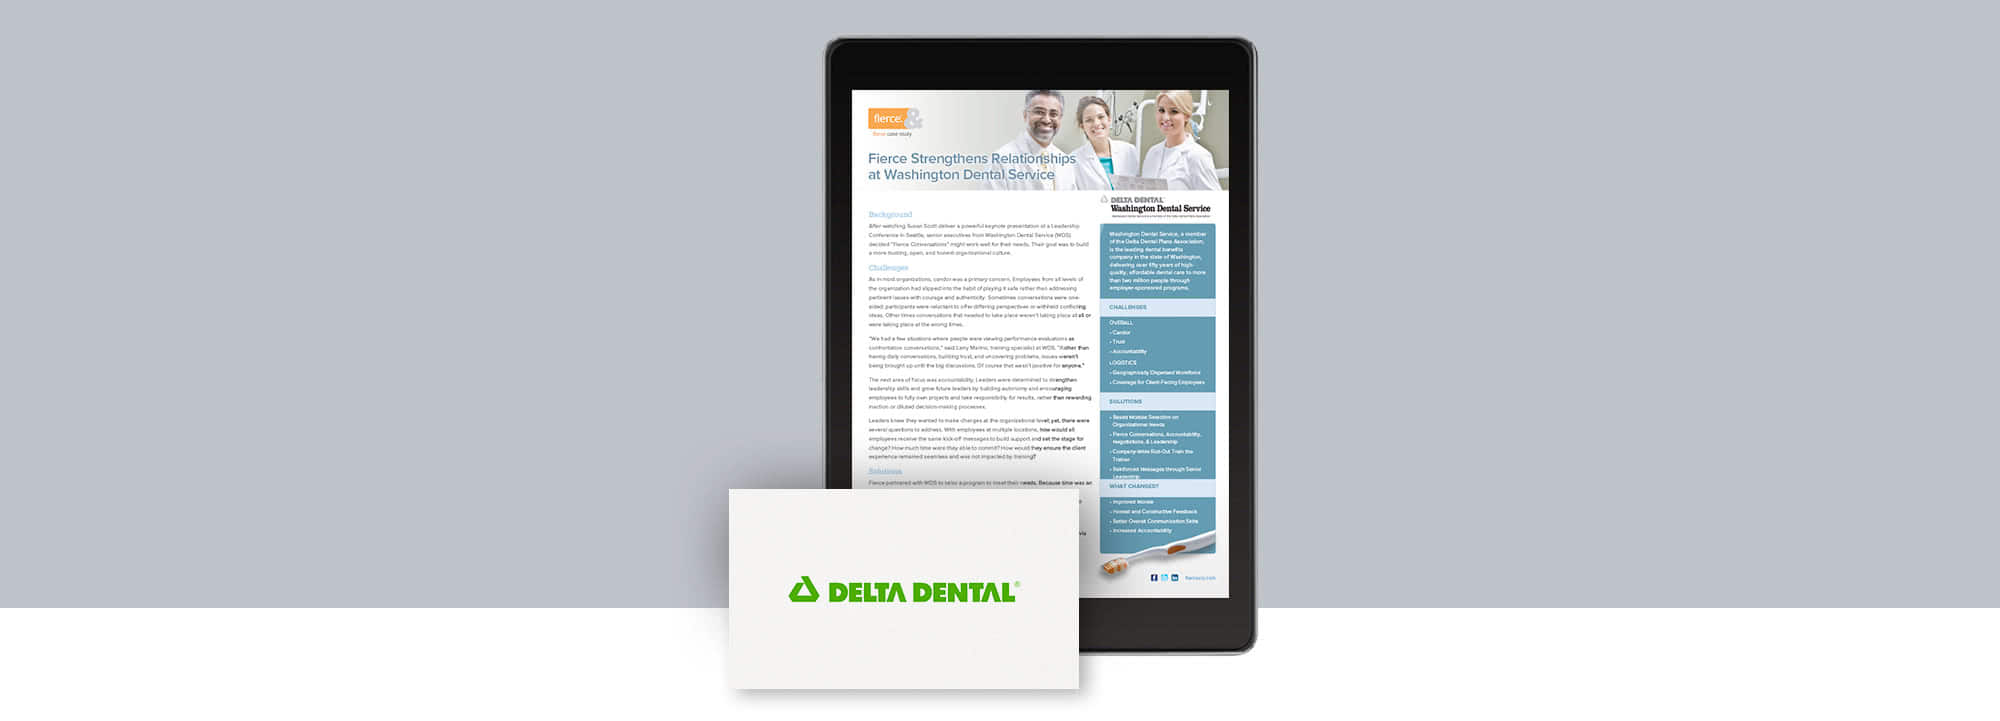 Fierce Conversations Washington Delta Dental Case Study